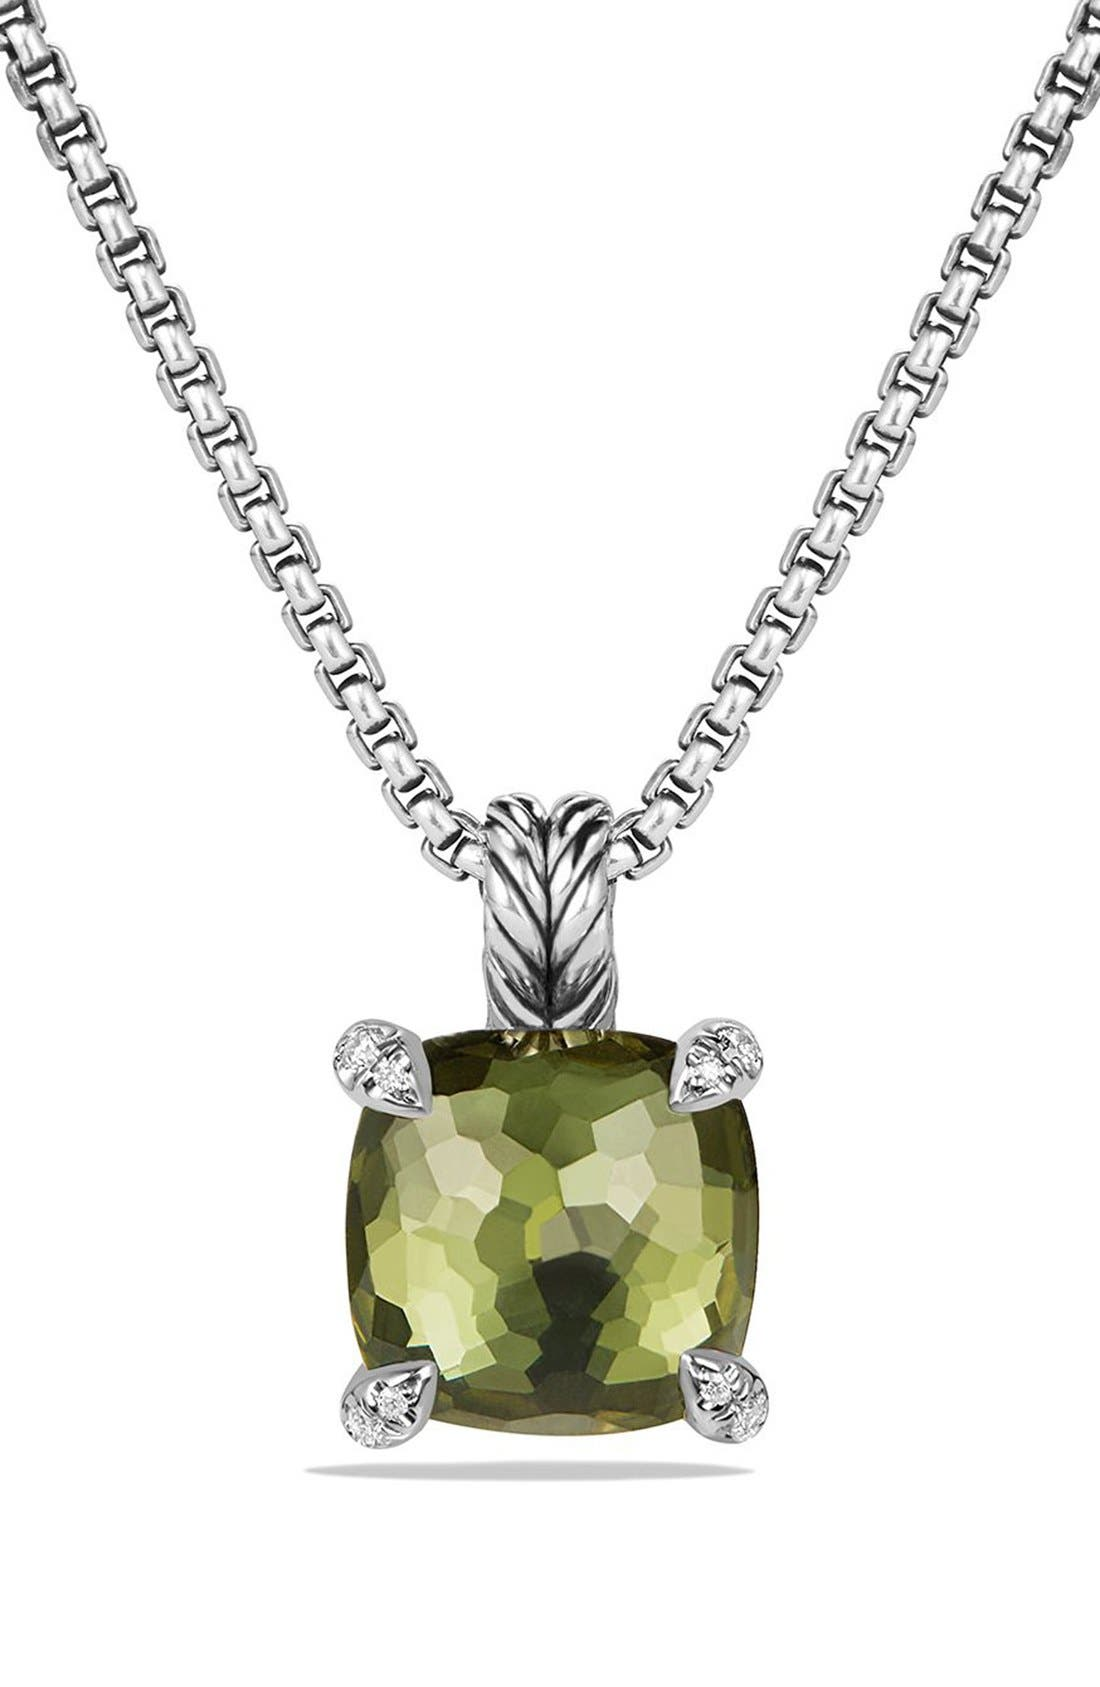 David Yurman 'Châtelaine' Pendant Necklace with Semiprecious Stone & Diamonds